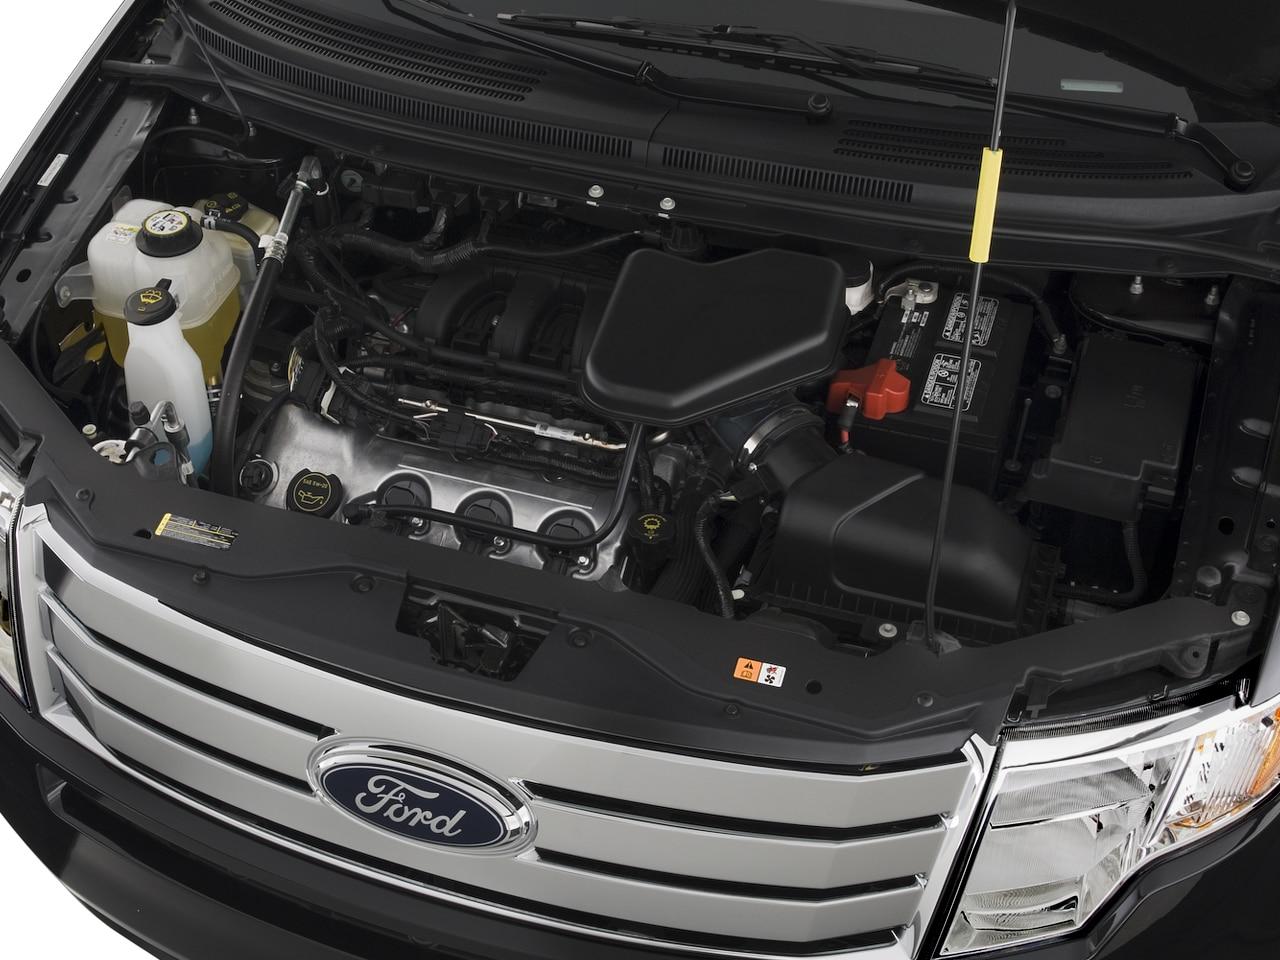 2008 ford edge wiring diagram bc 4600  2011 ford edge engine diagram  bc 4600  2011 ford edge engine diagram